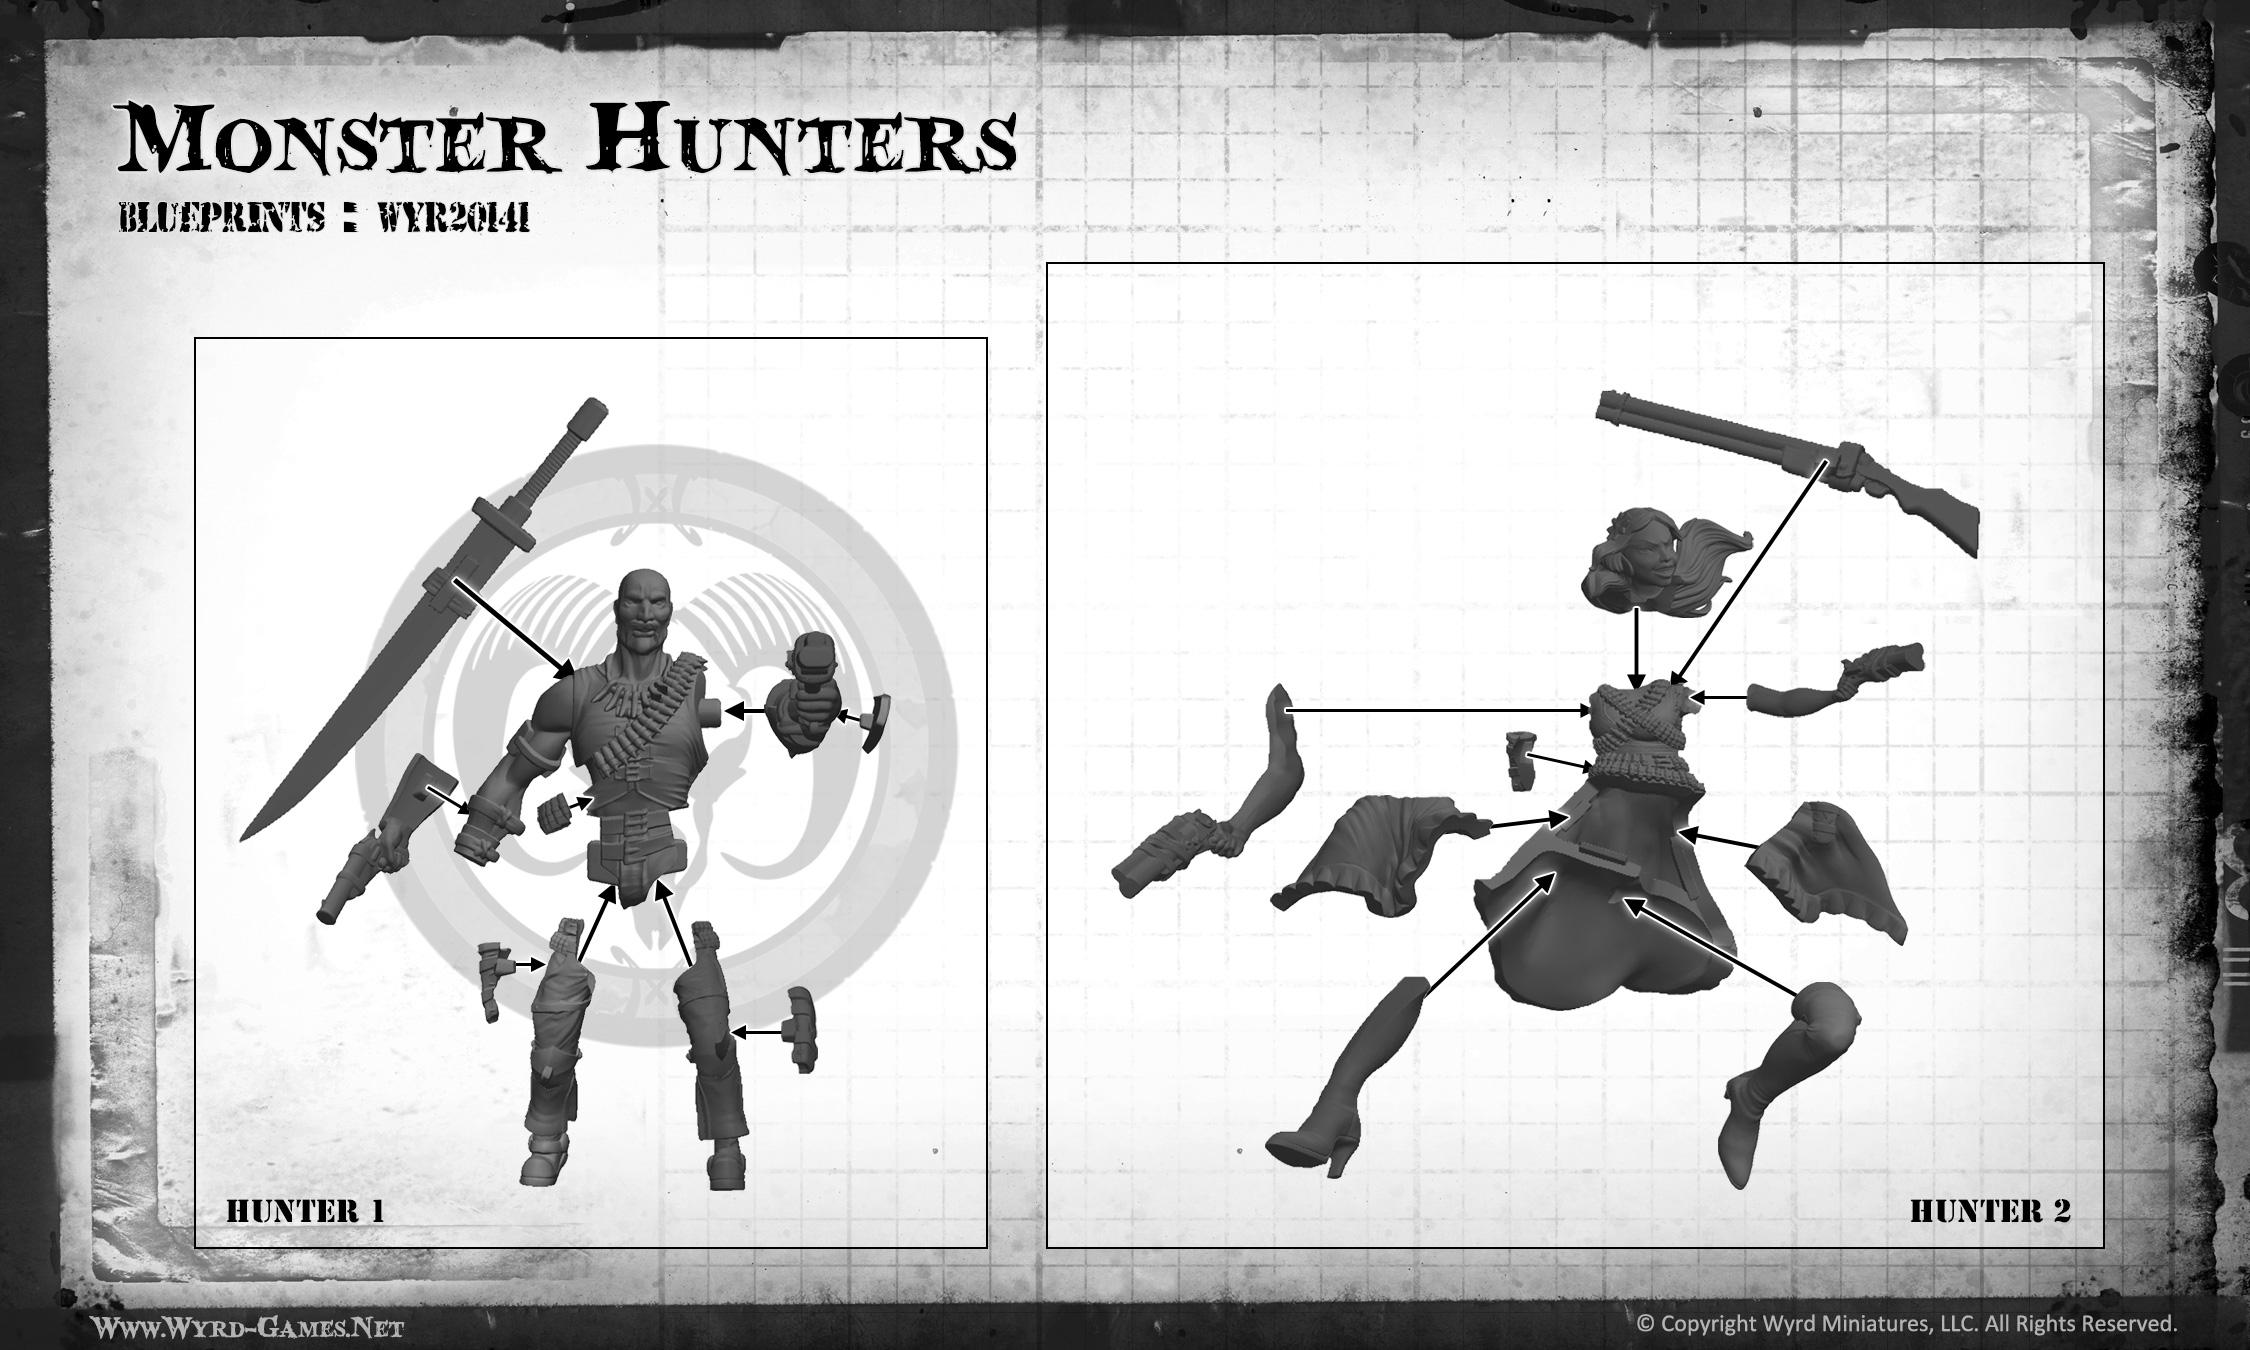 Instruction-WYR20141-MonsterHunters.jpg